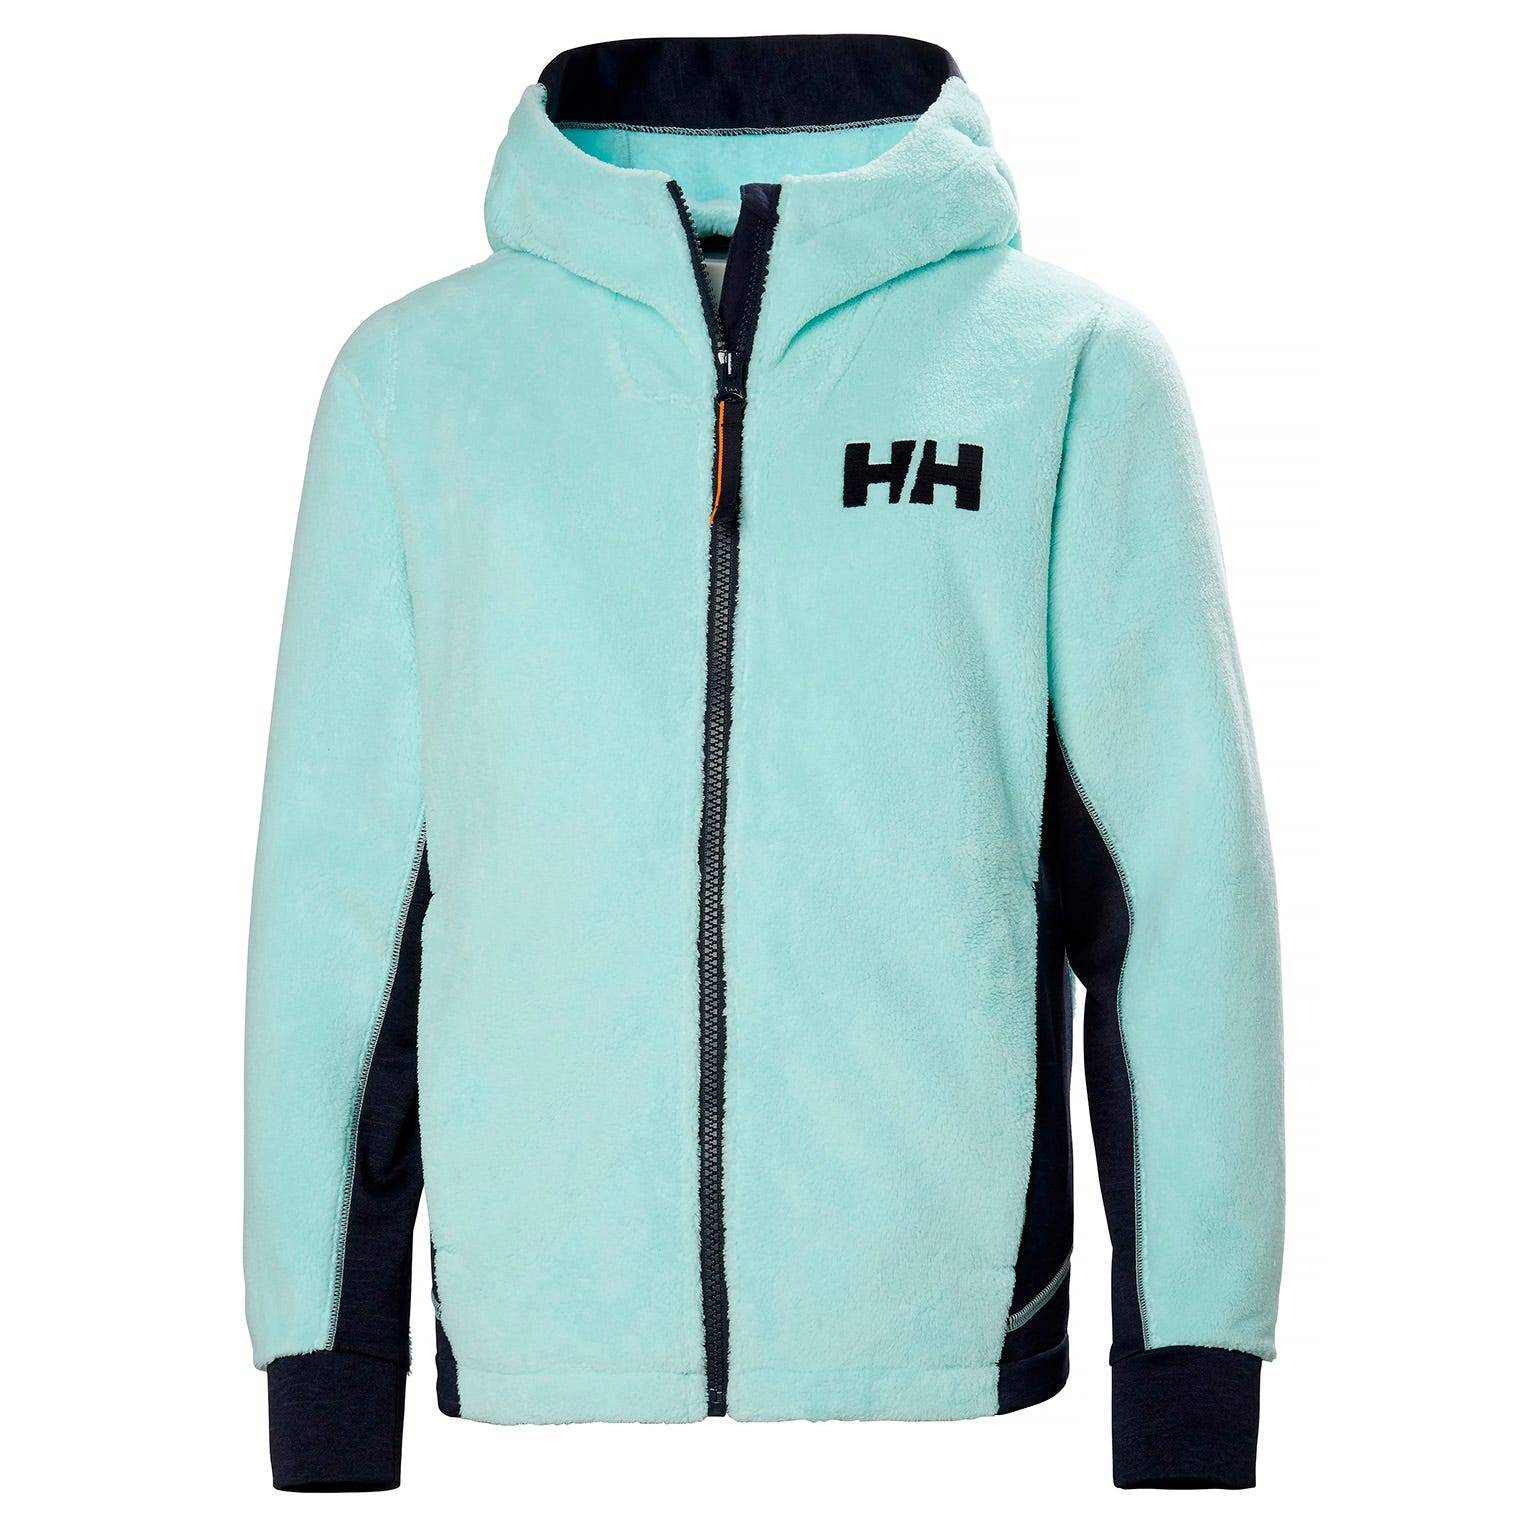 Helly Hansen Junior Chill Fz Hoodie Kids Fleece Blue 128/8